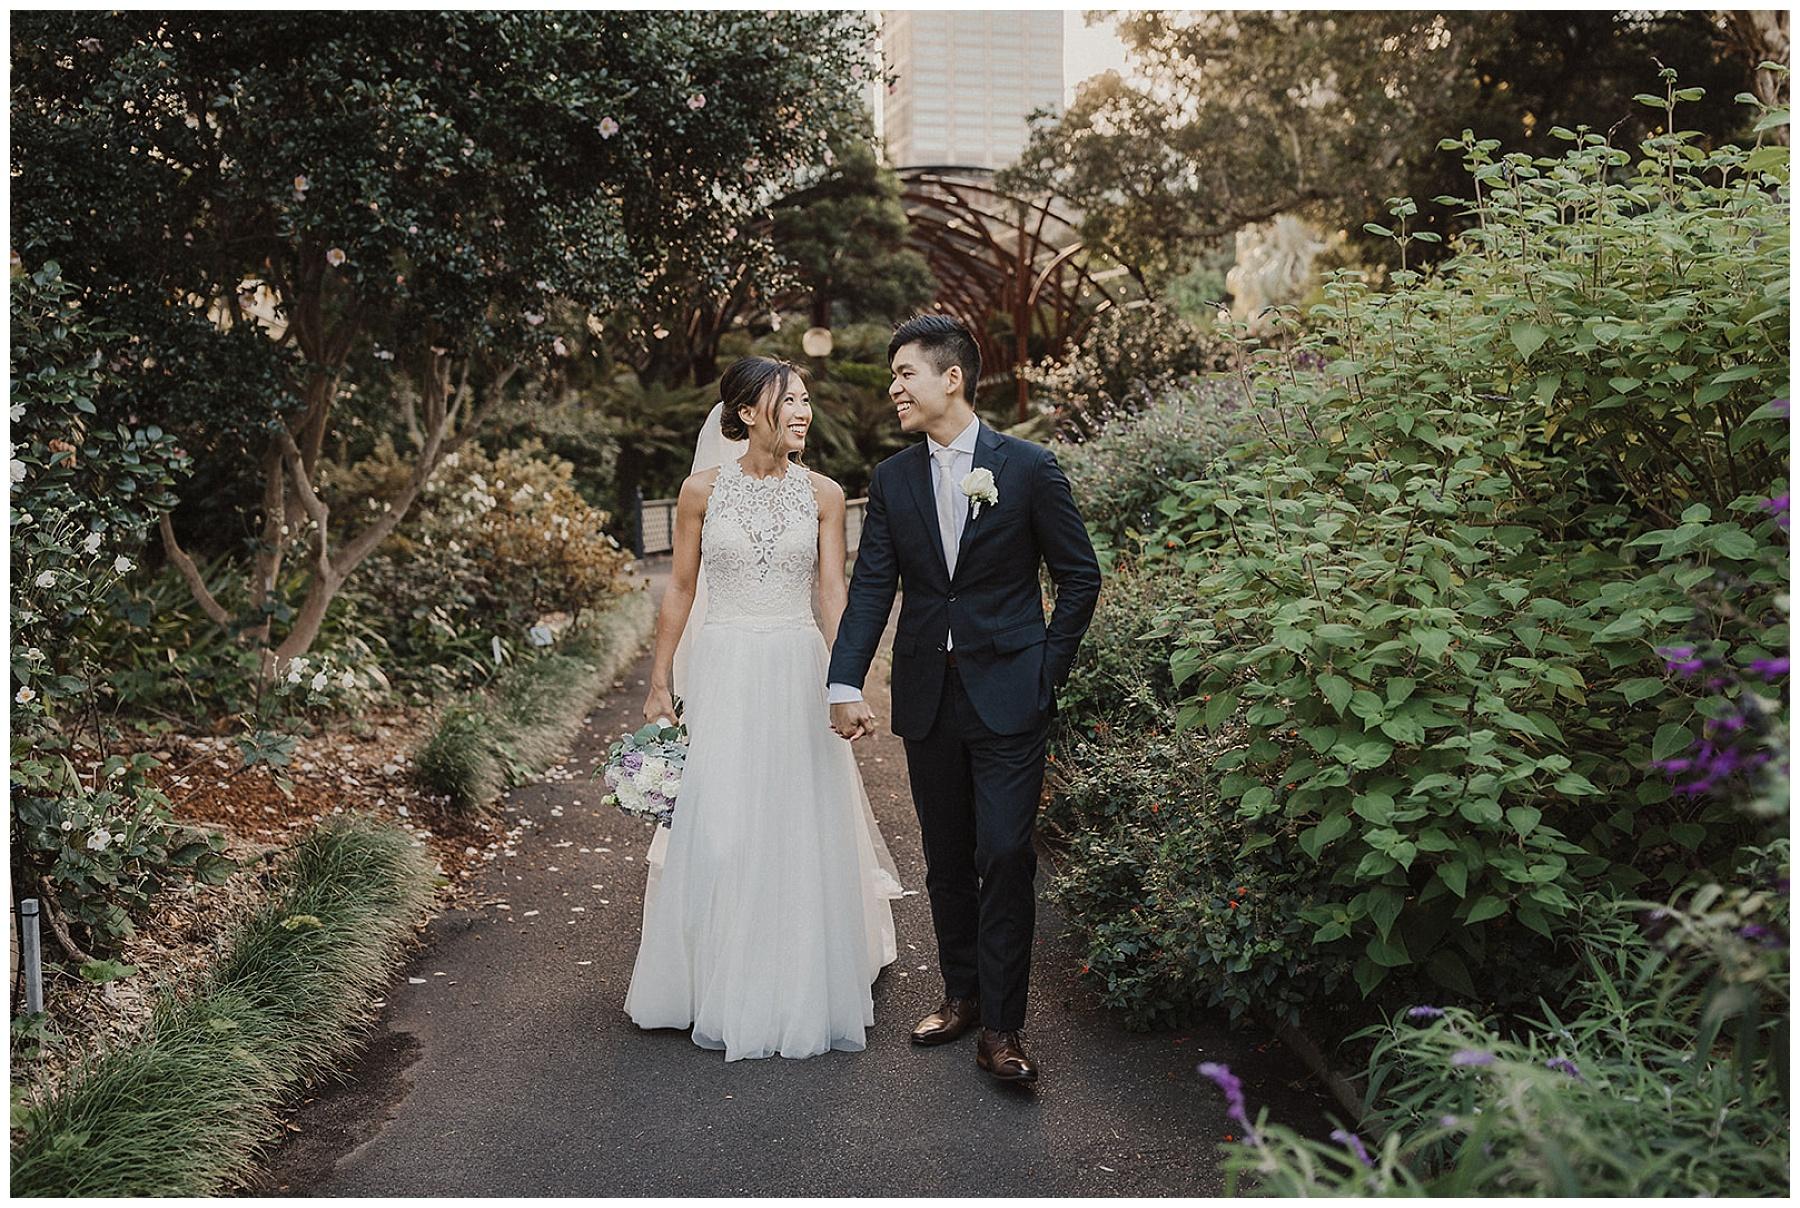 Sydney Bride and Groom in garden setting